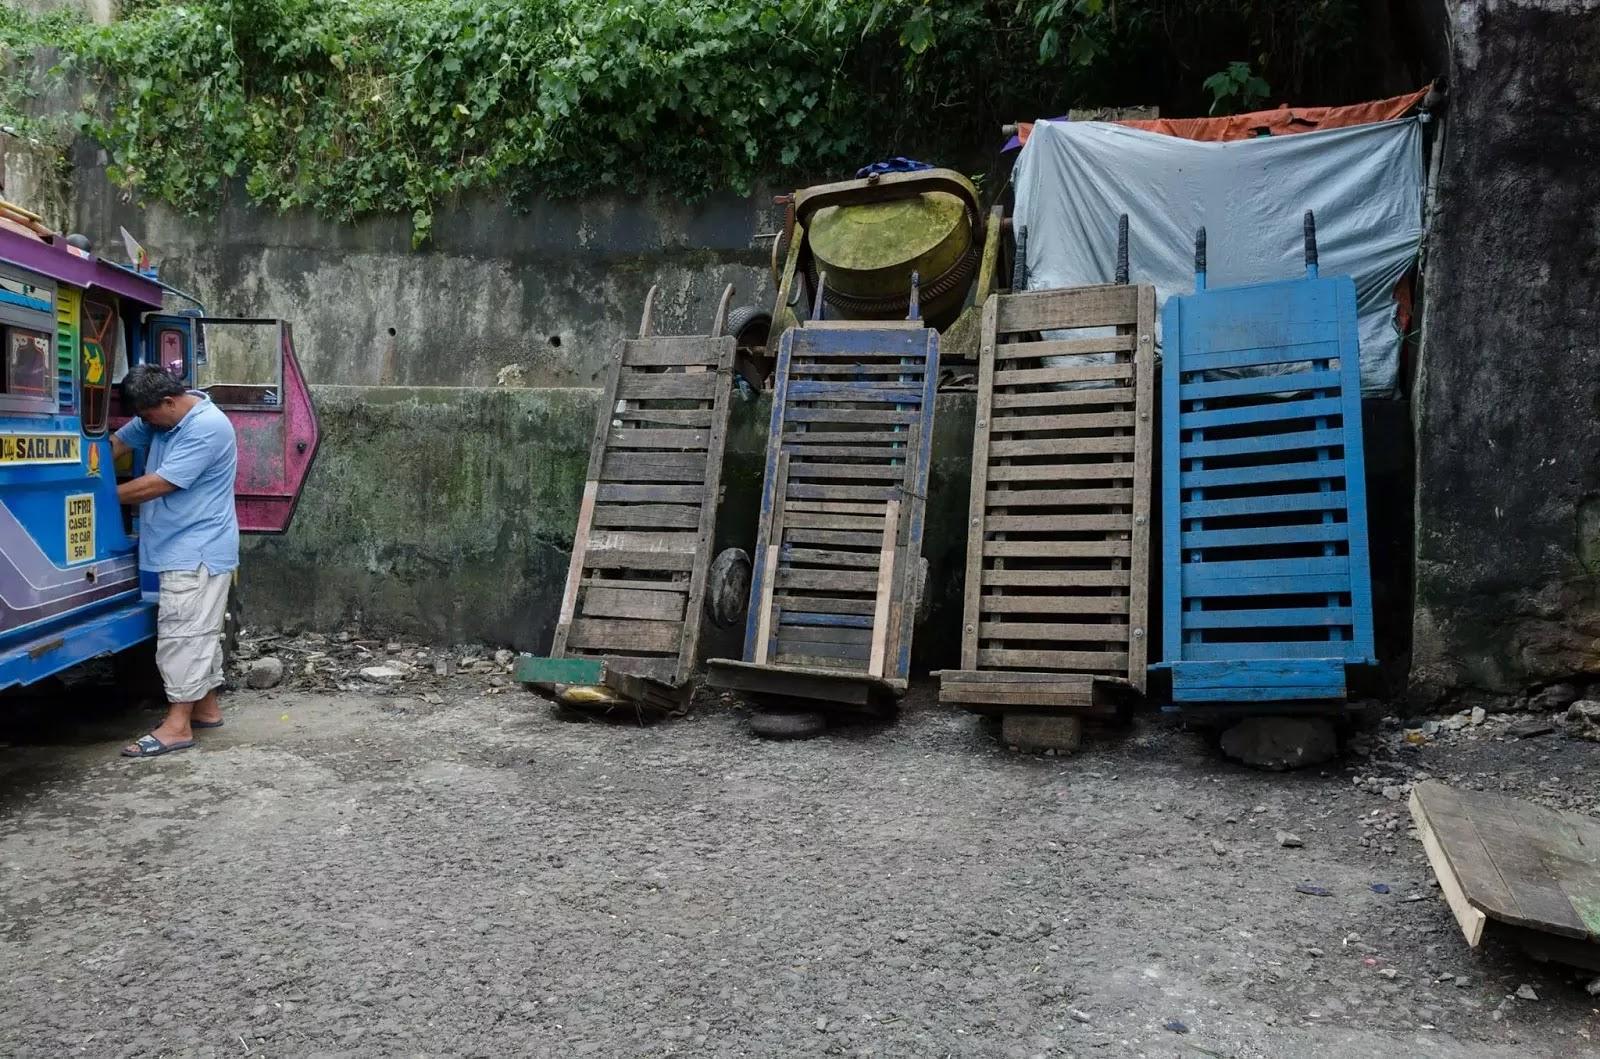 Porter Carts Abanao Baguio City Public Market Cordillera Administrative Region Philippines